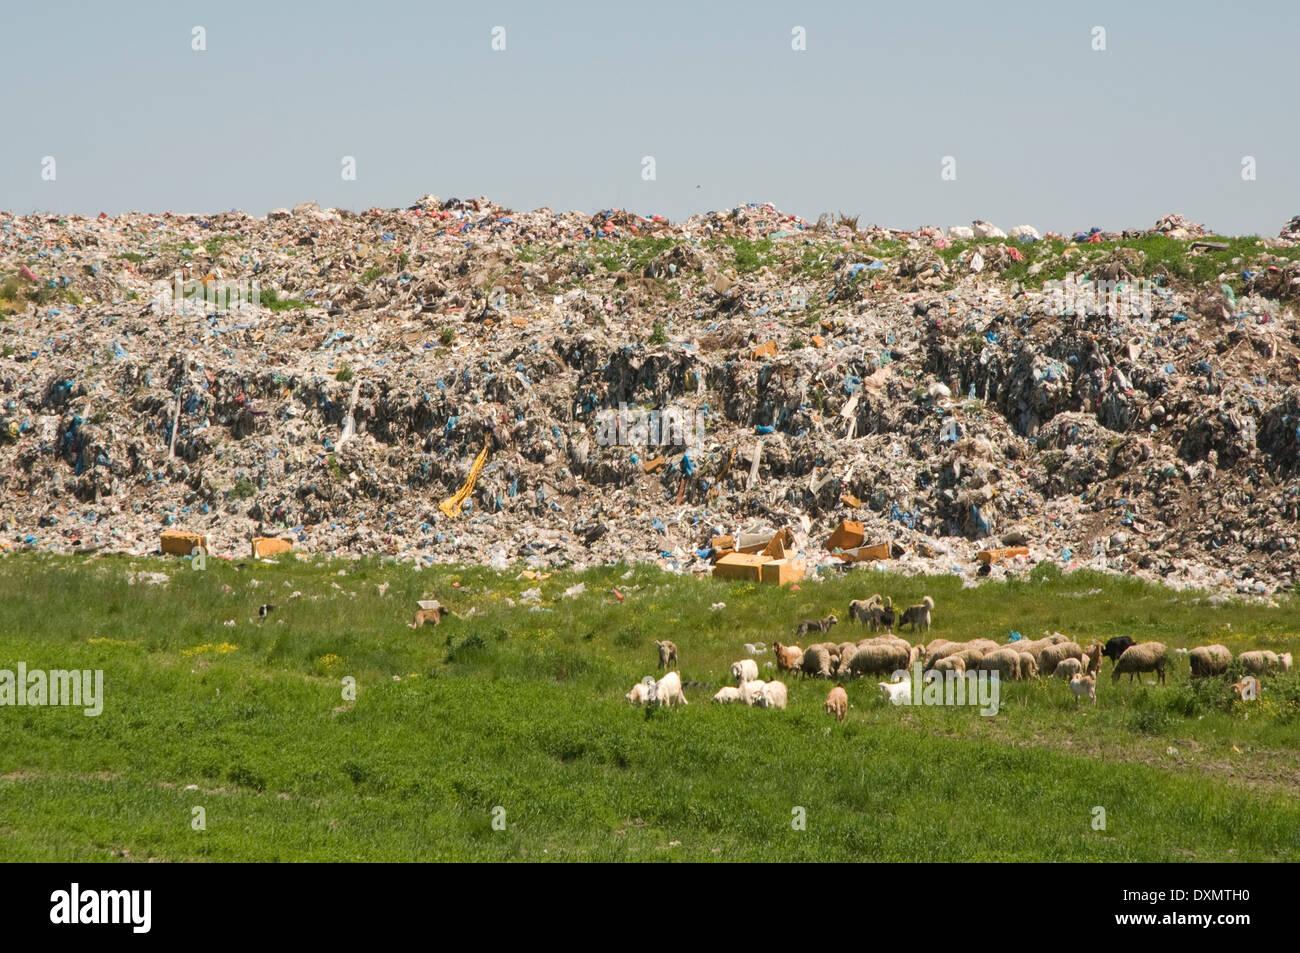 EUROPE/ASIA, Turkey, landfill site outside city next to the E80 motorway - Stock Image